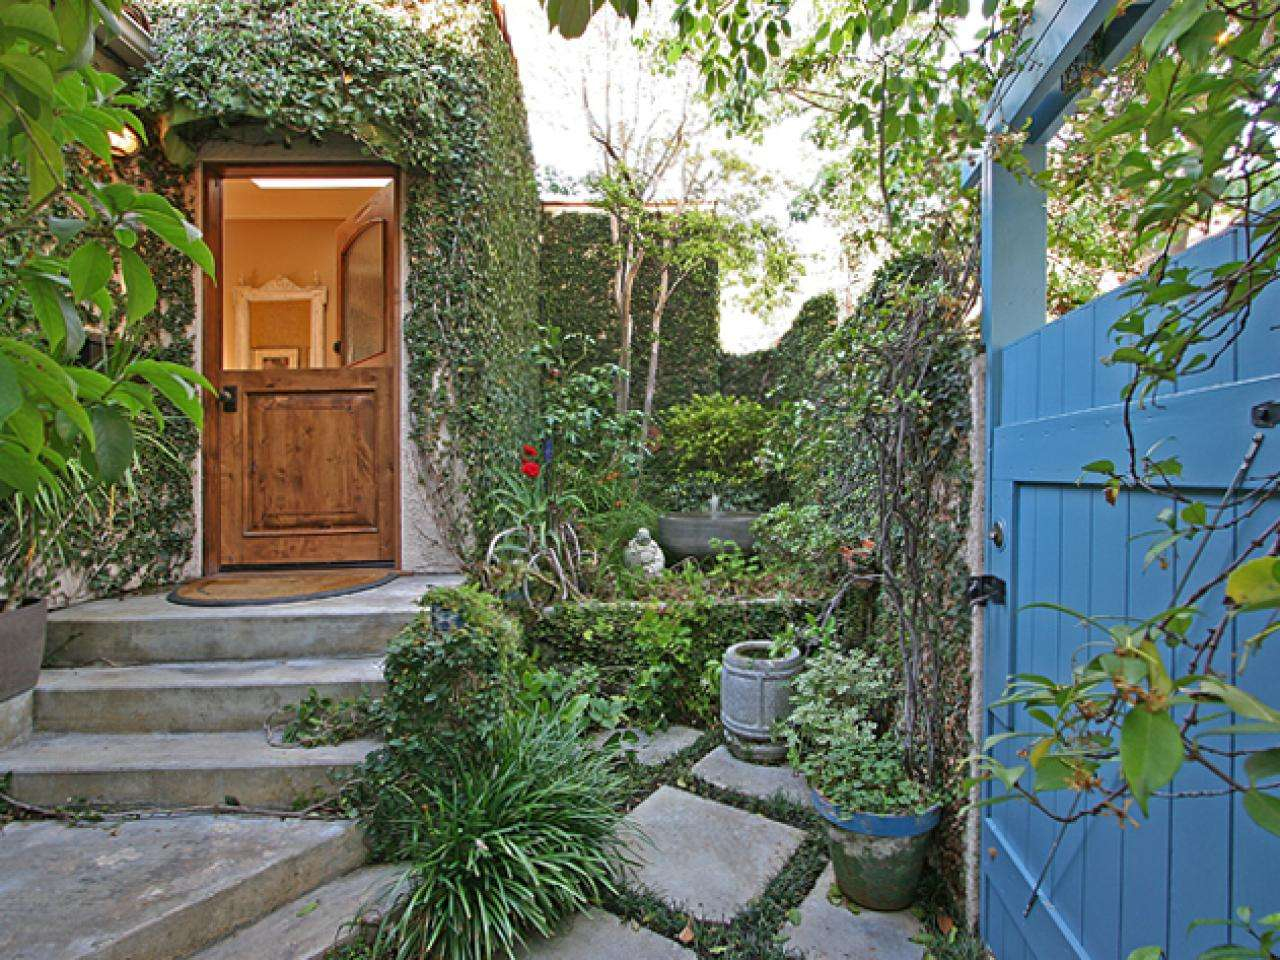 Mediterranean Inspired Courtyards Outdoor Spaces Patio Ideas